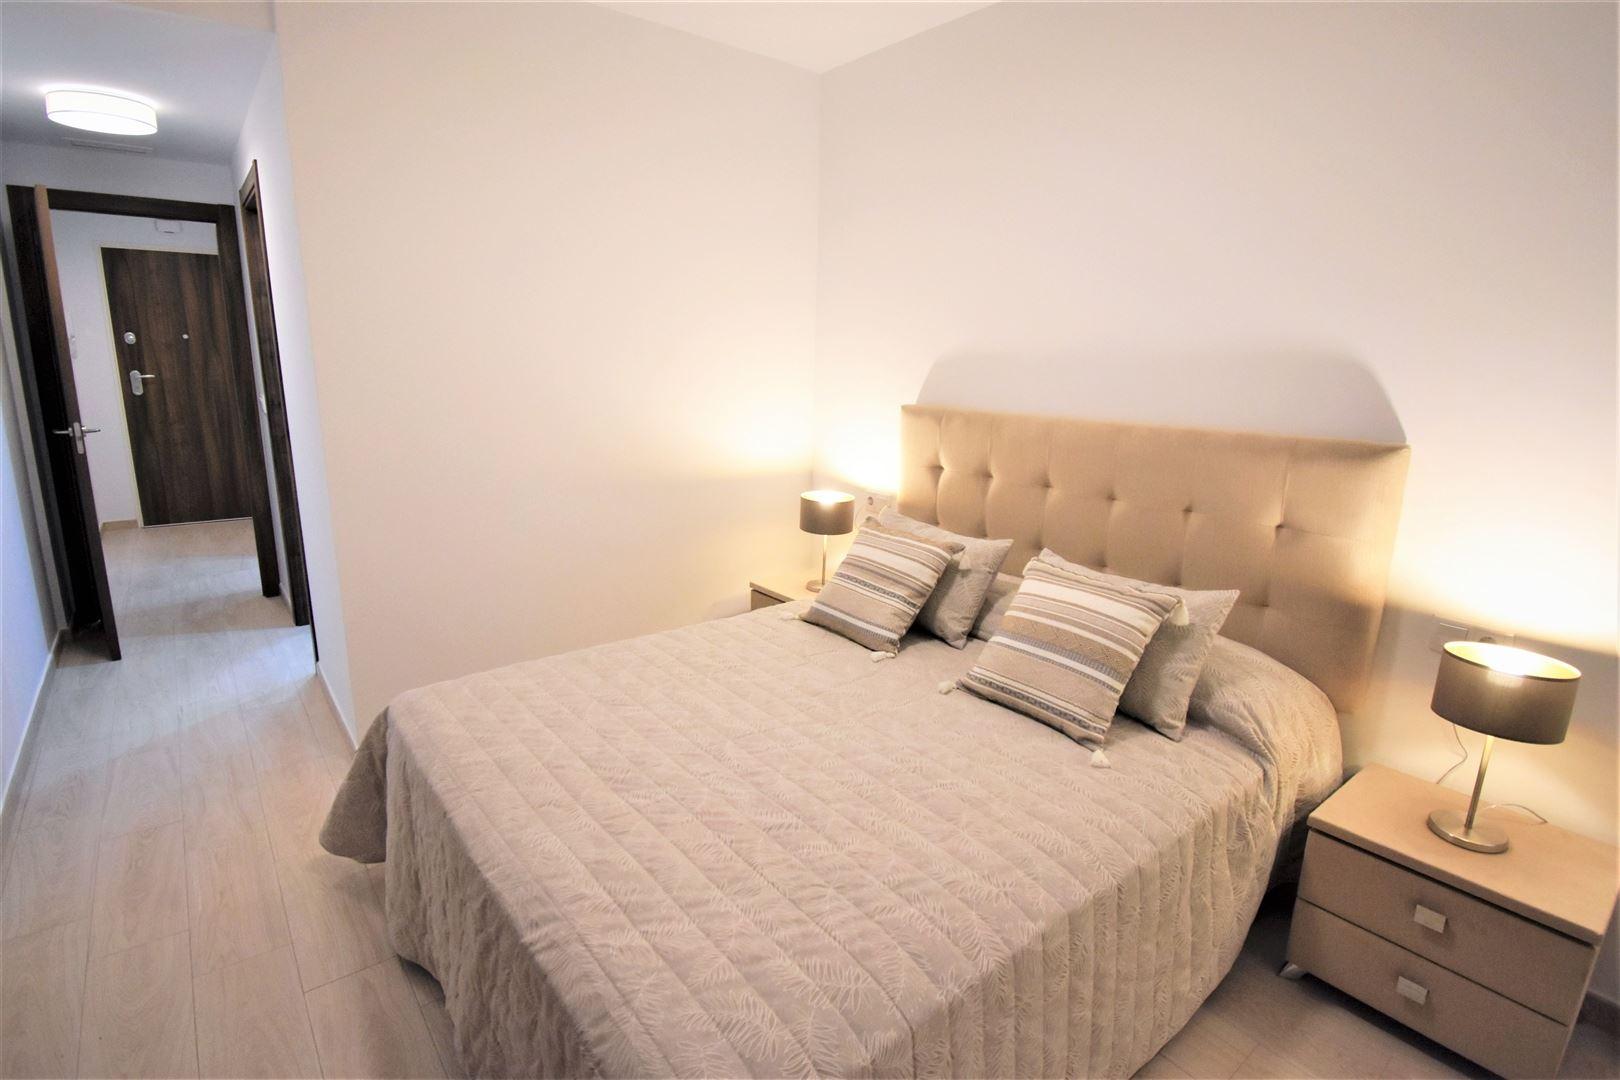 Foto 6 : Appartement te   (Spanje) - Prijs € 186.000